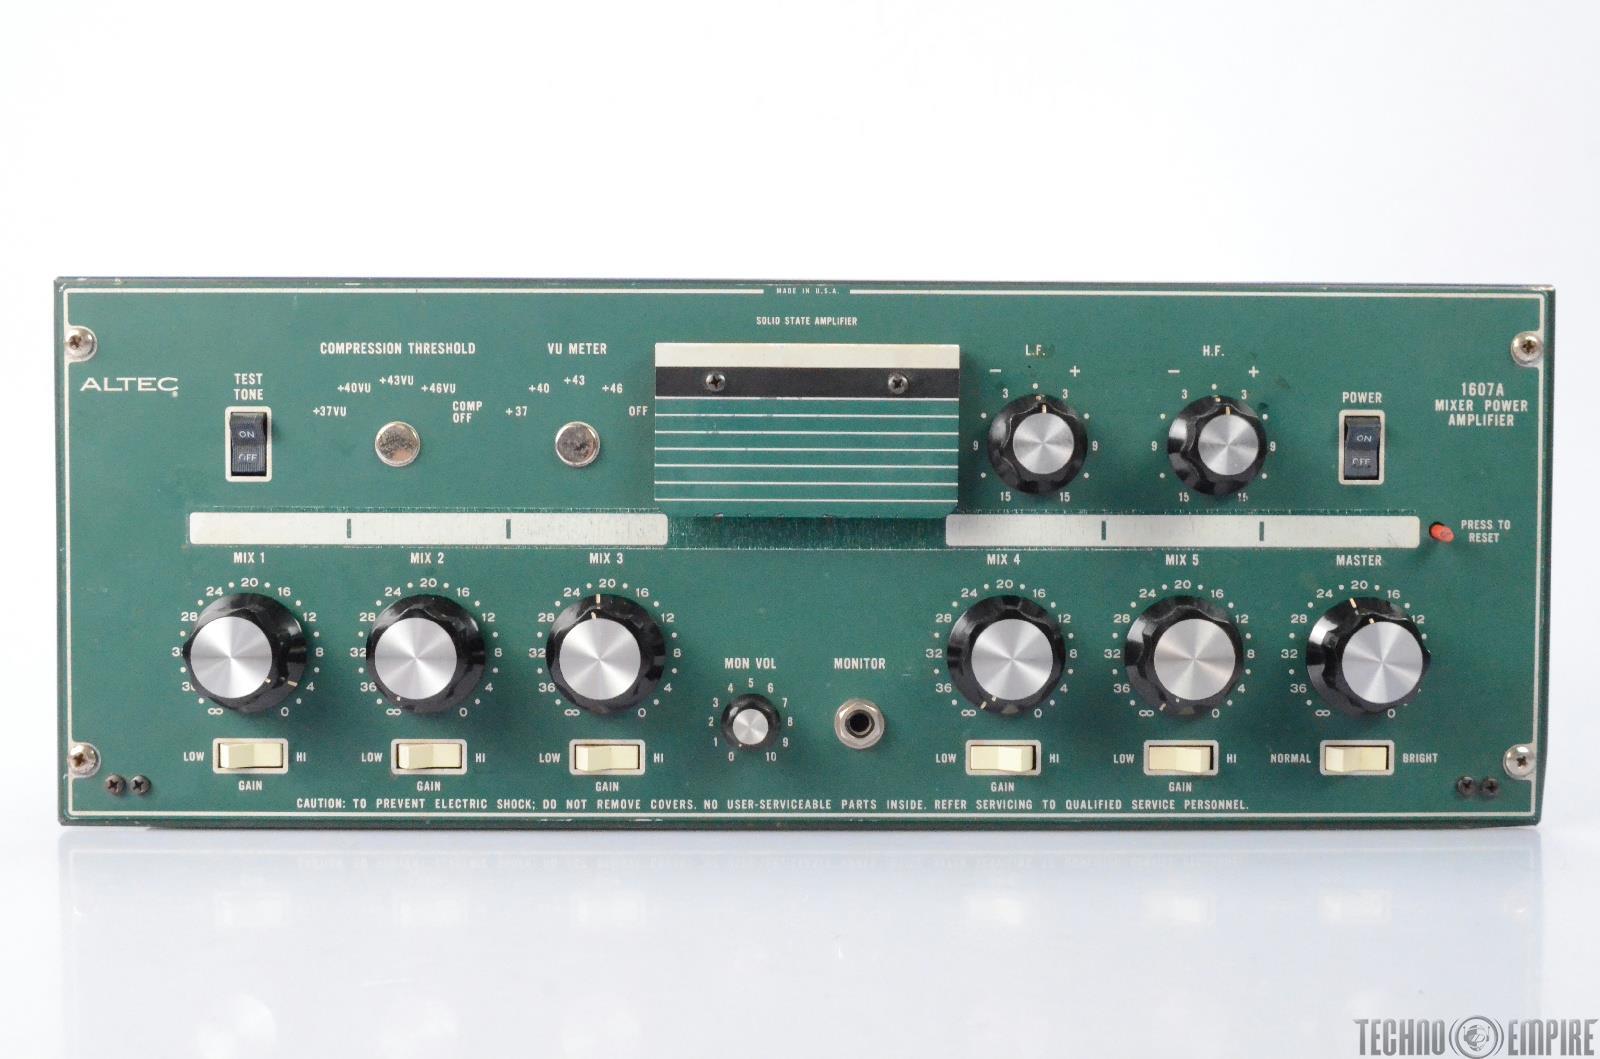 Altec 1607A Mono Mixer Power Solid State Amplifier Fairfax Recordings #28669